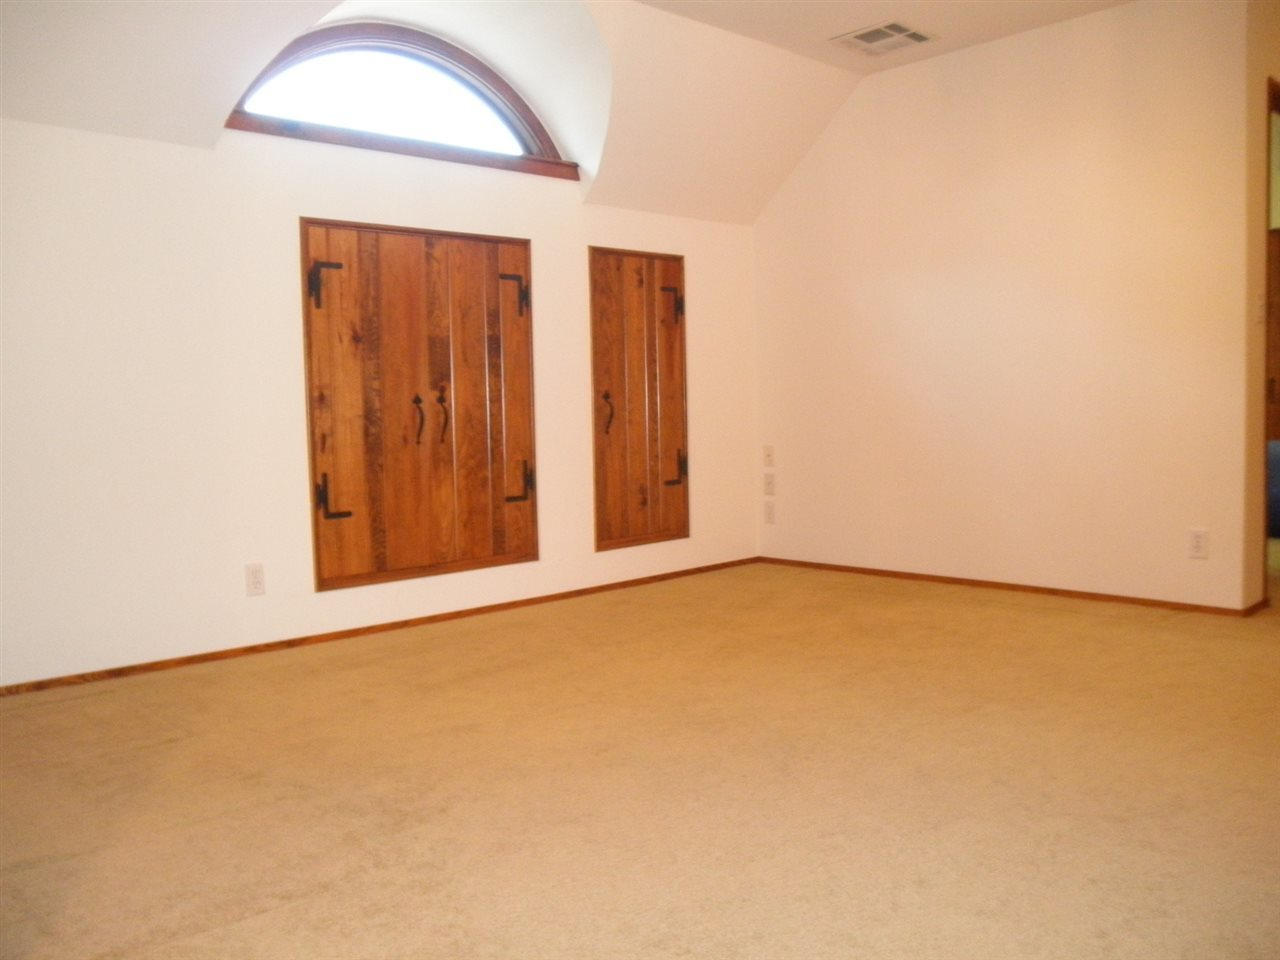 Sold Cross Sale W/ MLS | 88 Elmwood  Ponca City, OK 74601 27